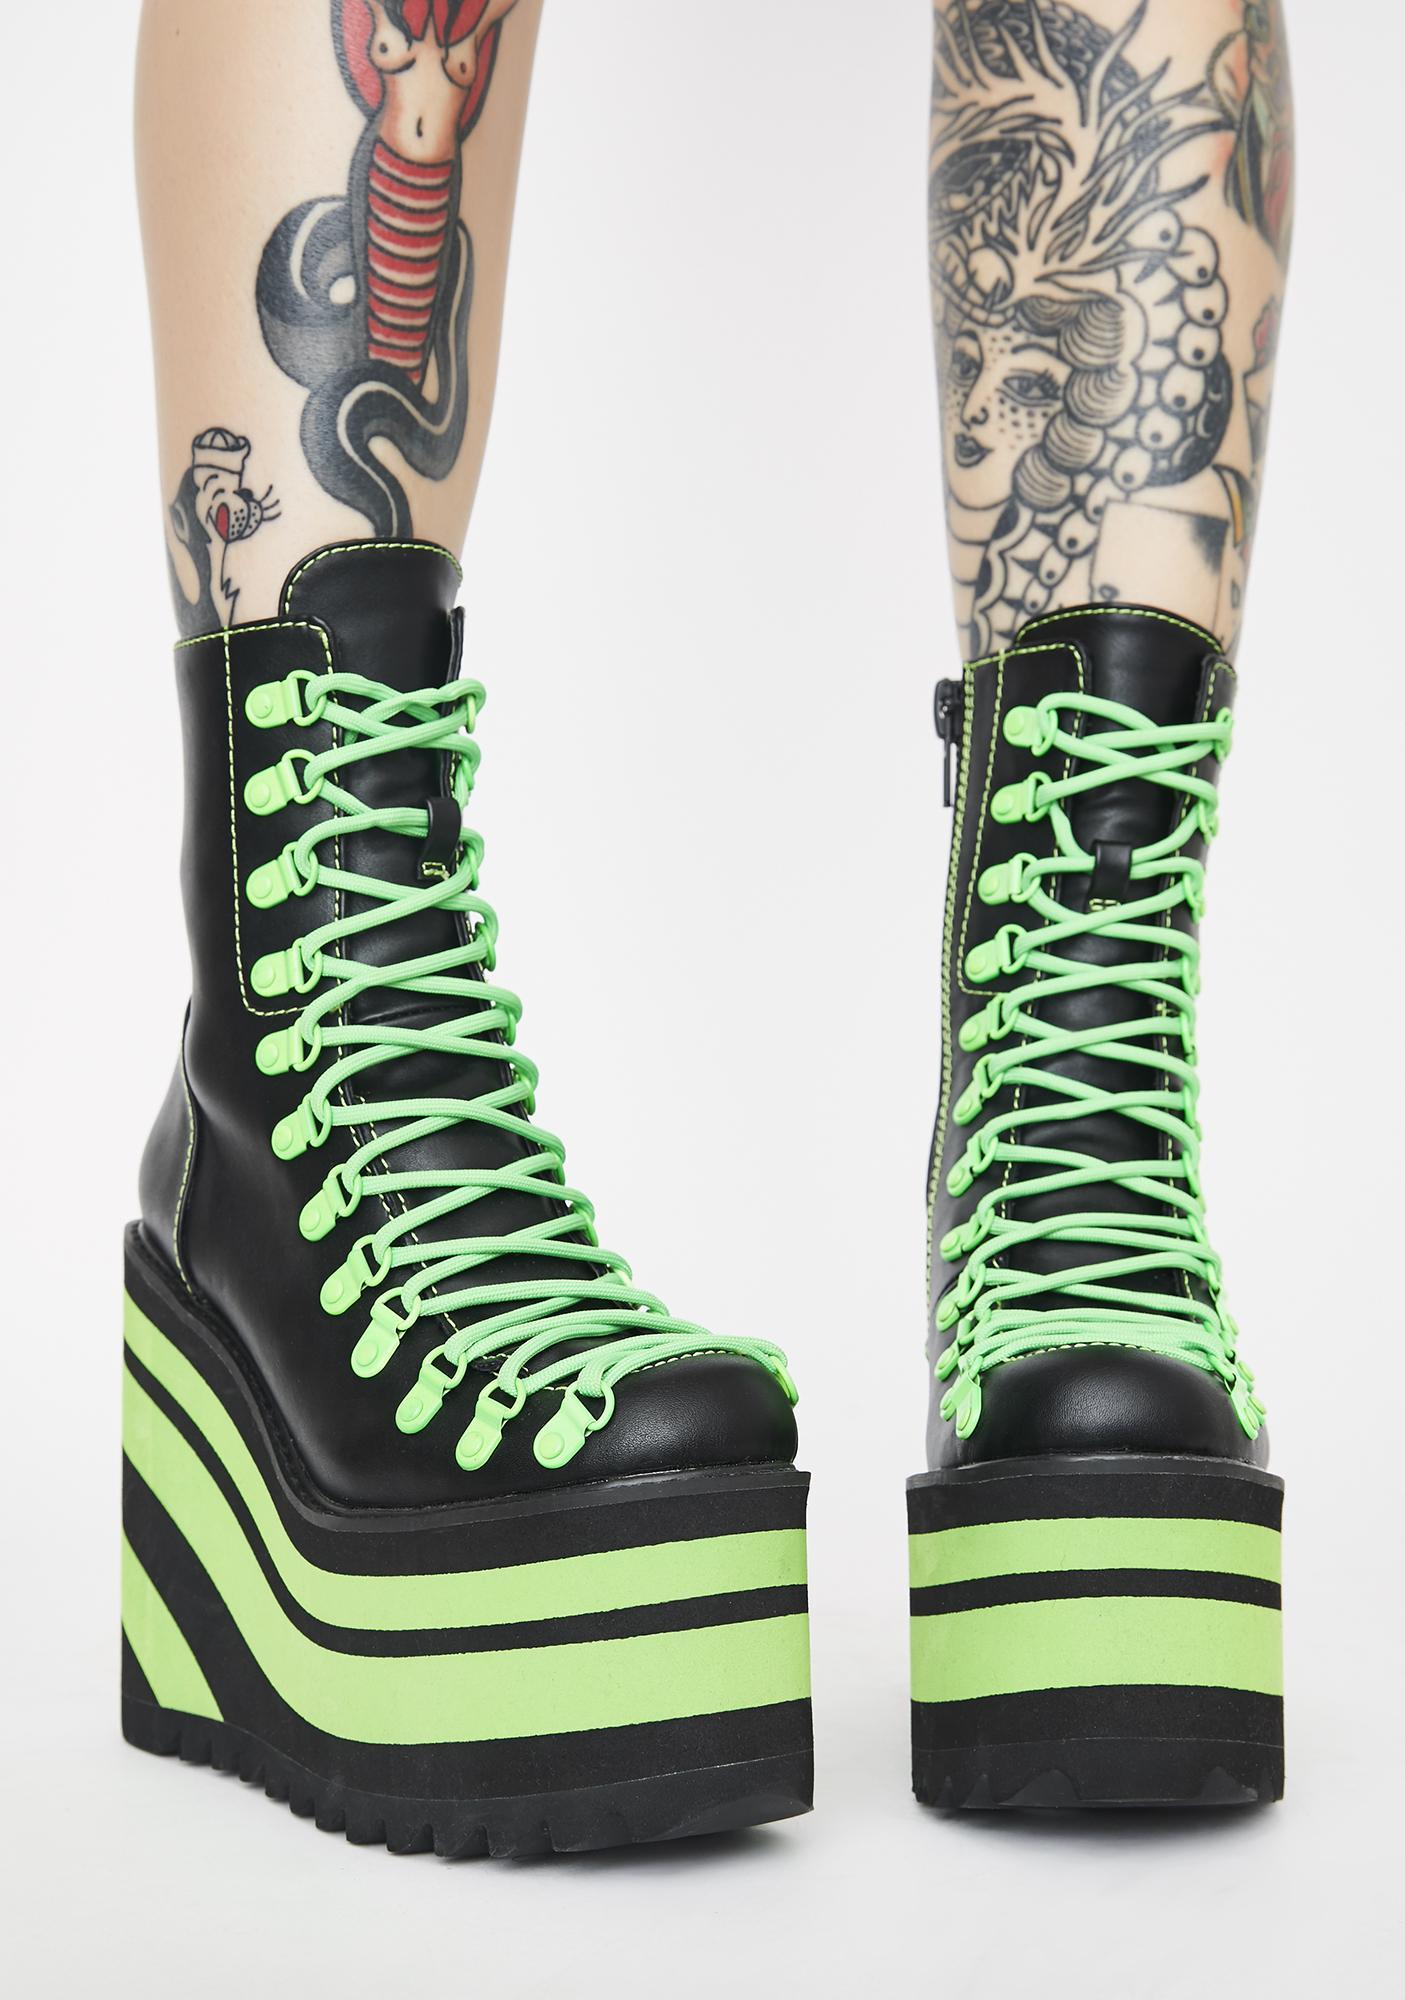 Club Exx Neon Jawbreaker Traitor Boots